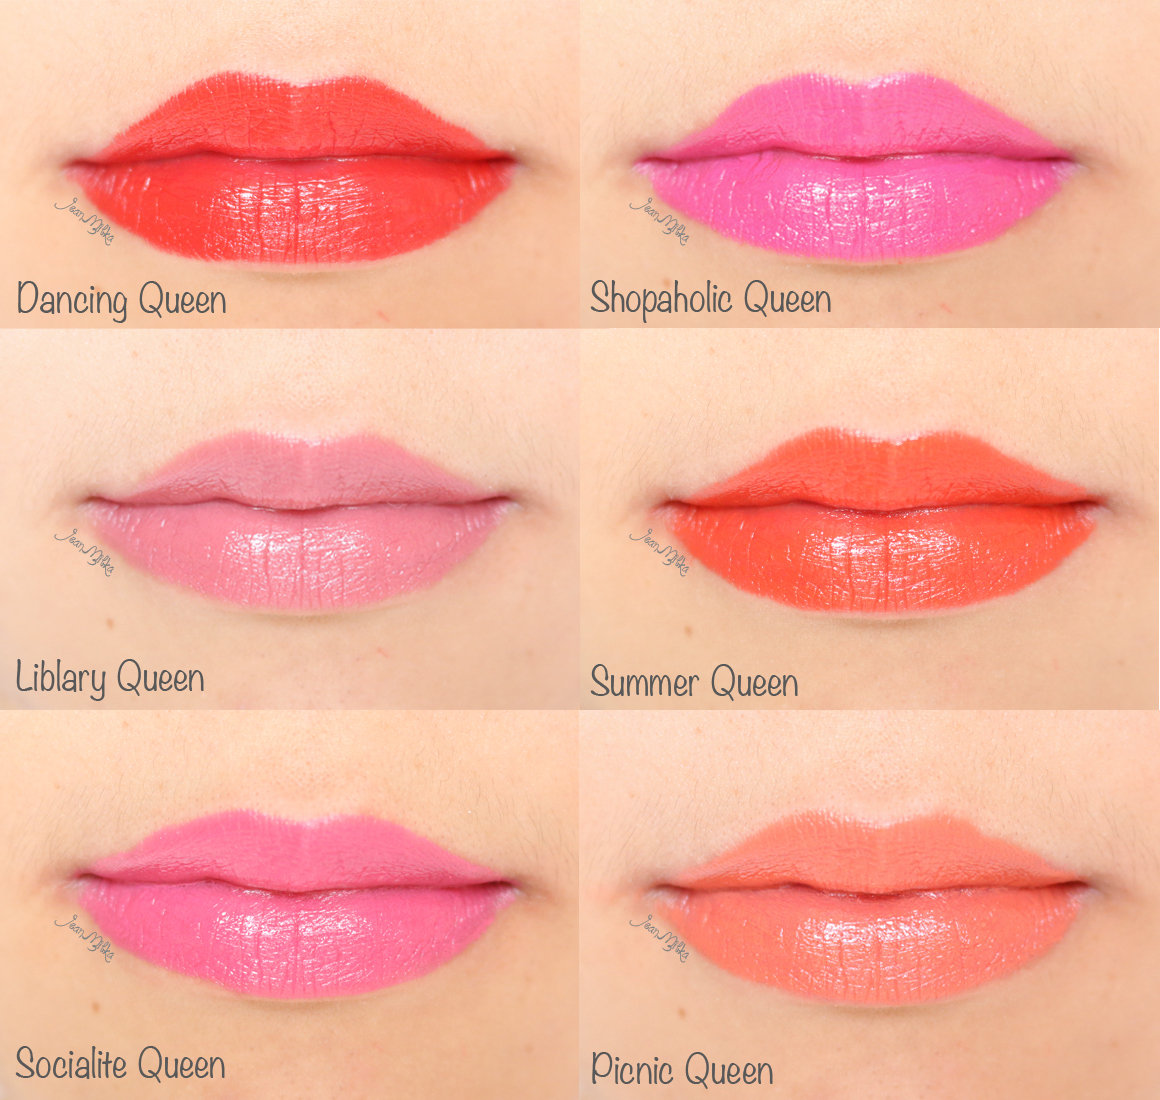 emina, emina cosmetics, makeup, my favourite things lip colour balm, review, swatch, emina balm, emina my favourite things, colour balm, drugstore, makeup murah